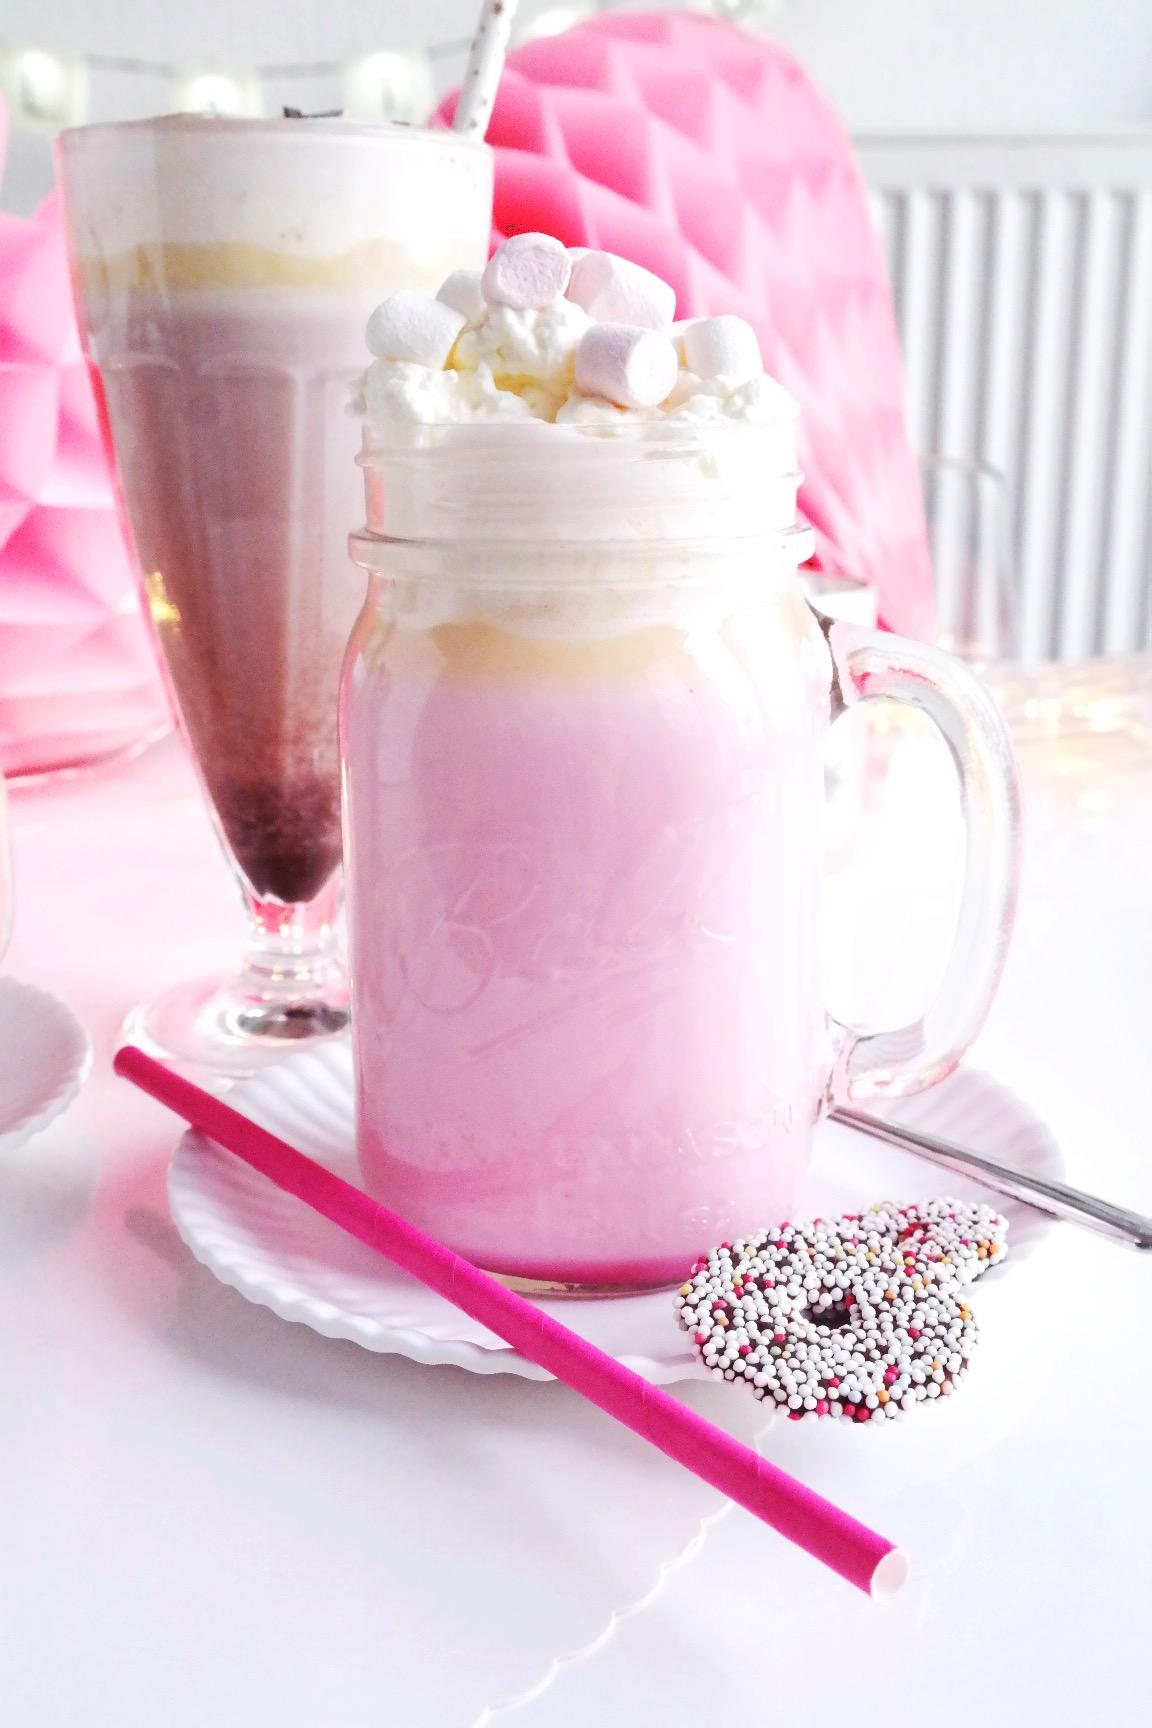 missbonnebonne-maedelsabend-wintergetraenke-kakao-heisse-schokolade-blog-bonn-koeln-5